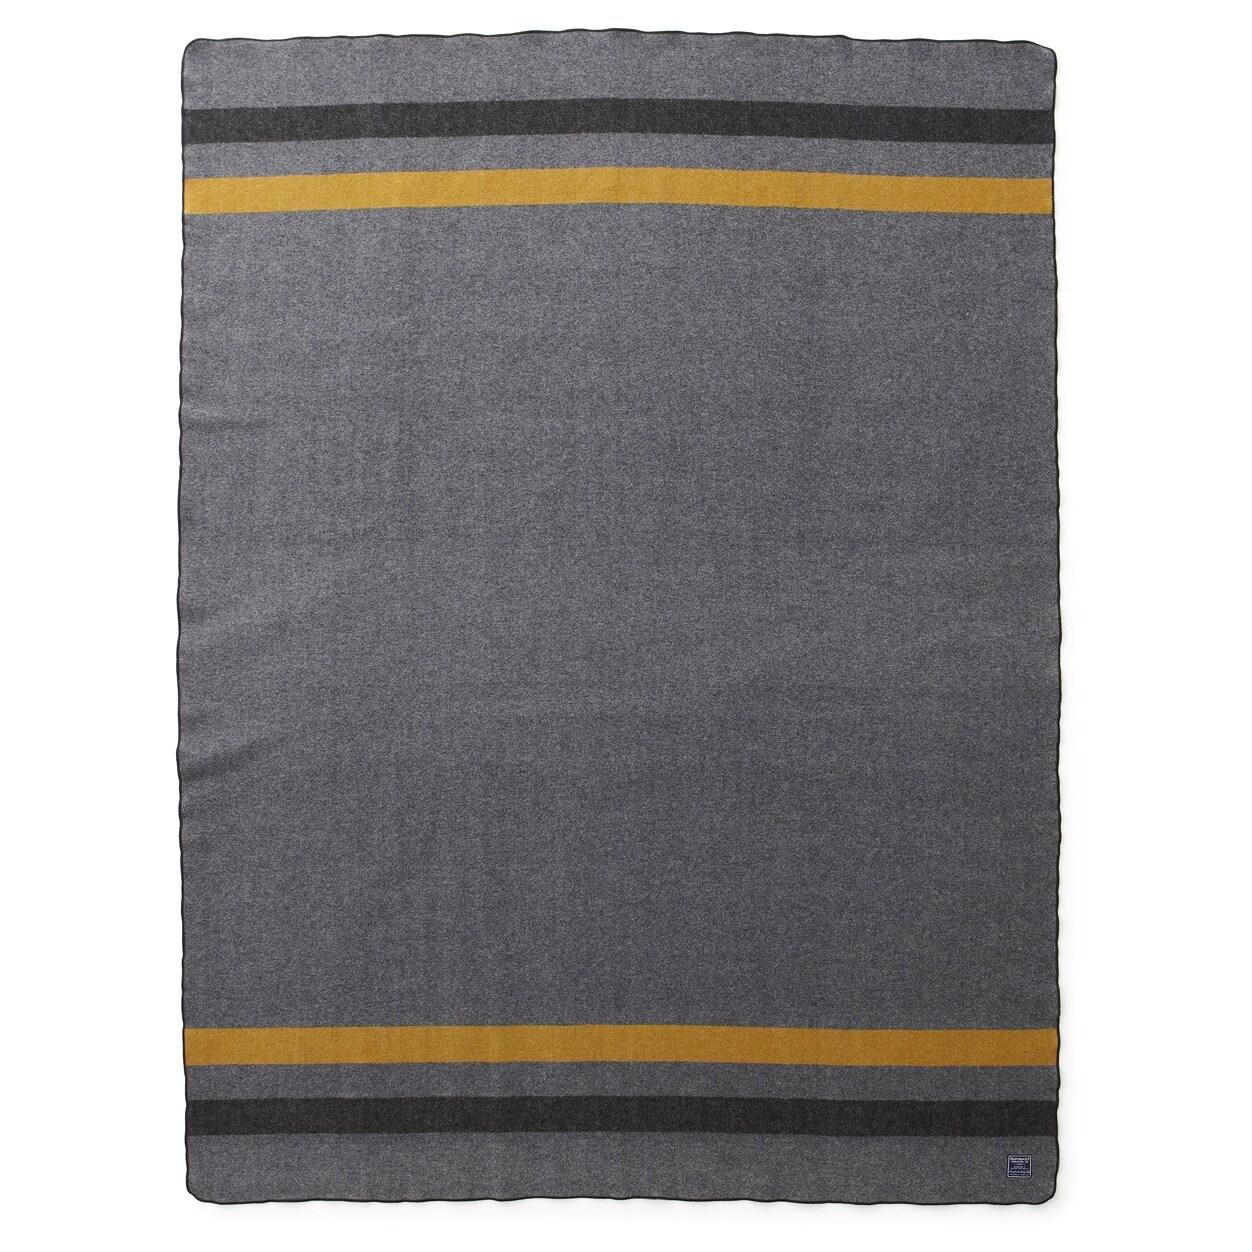 Faribault Mills Foot Soldier Military Blanket in Grey-Bla...